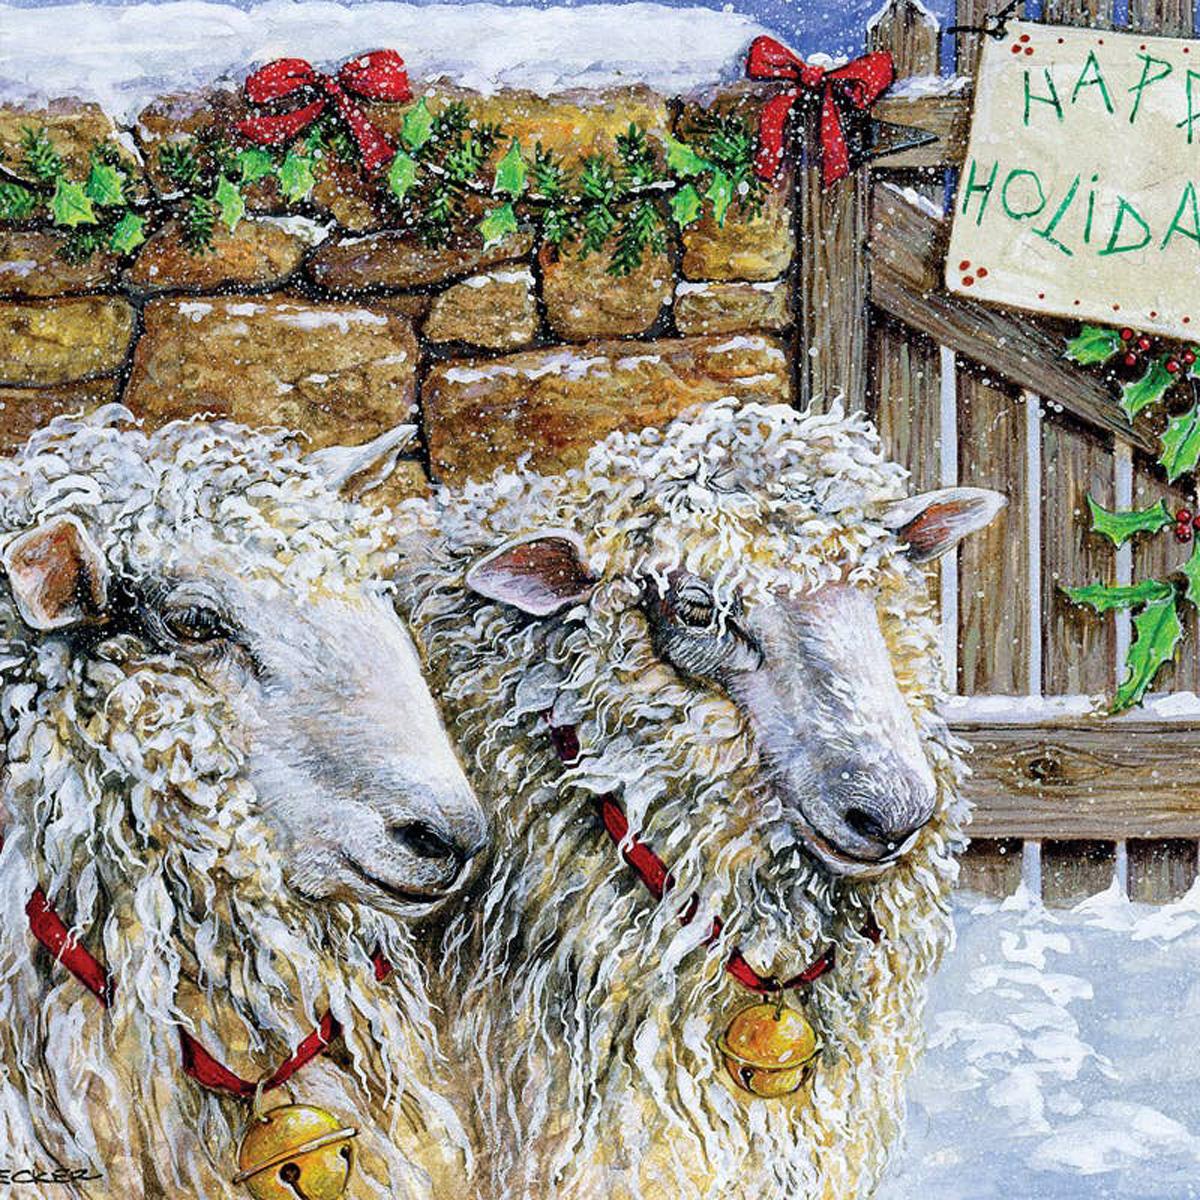 Sheep at the Gate Farm Jigsaw Puzzle